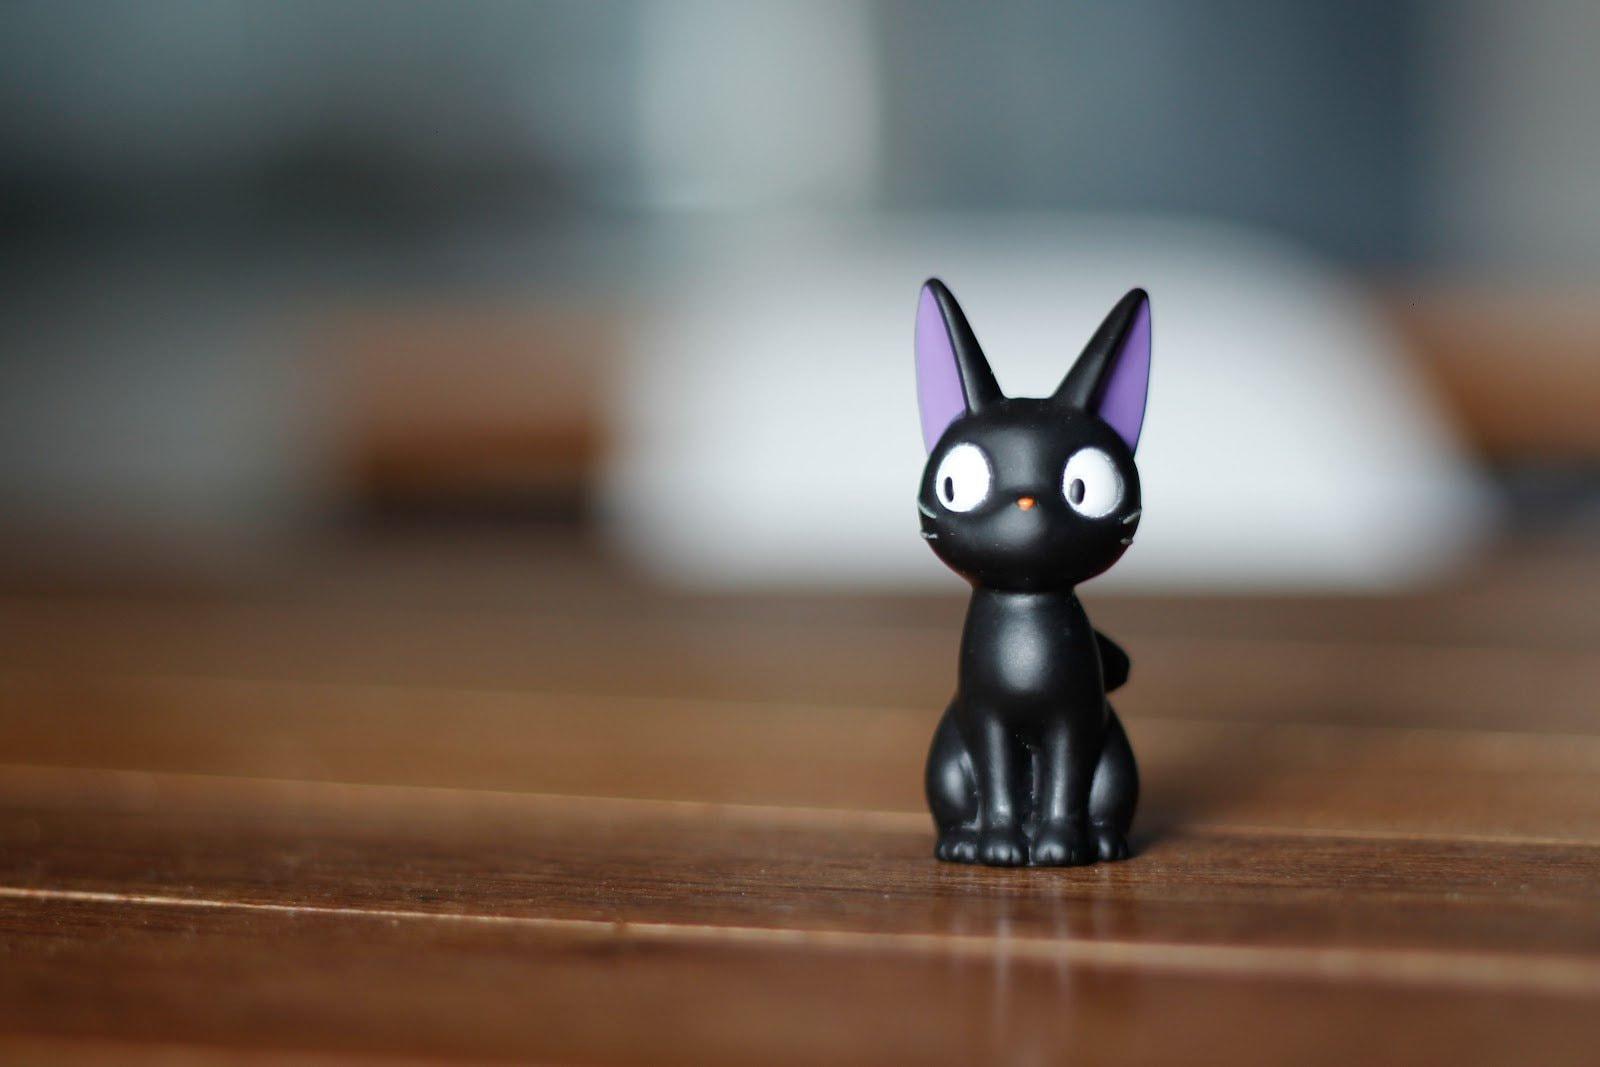 Black toy cat